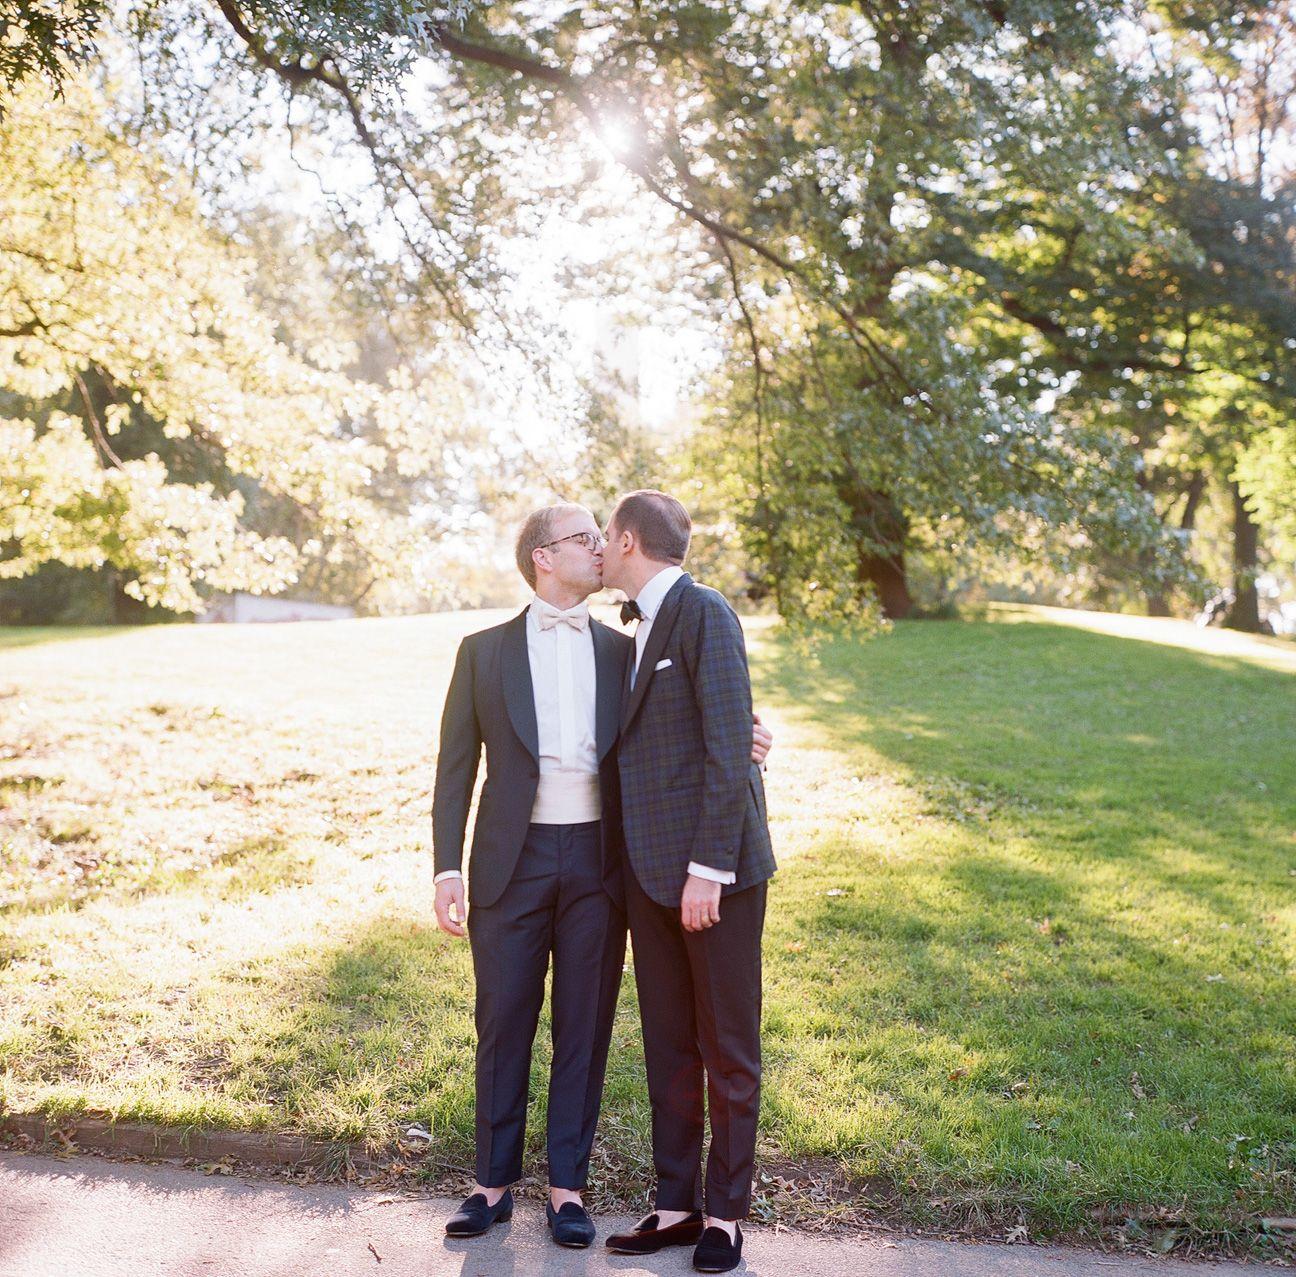 KarenHillPhotography-Brune-Wedding-0180.jpg